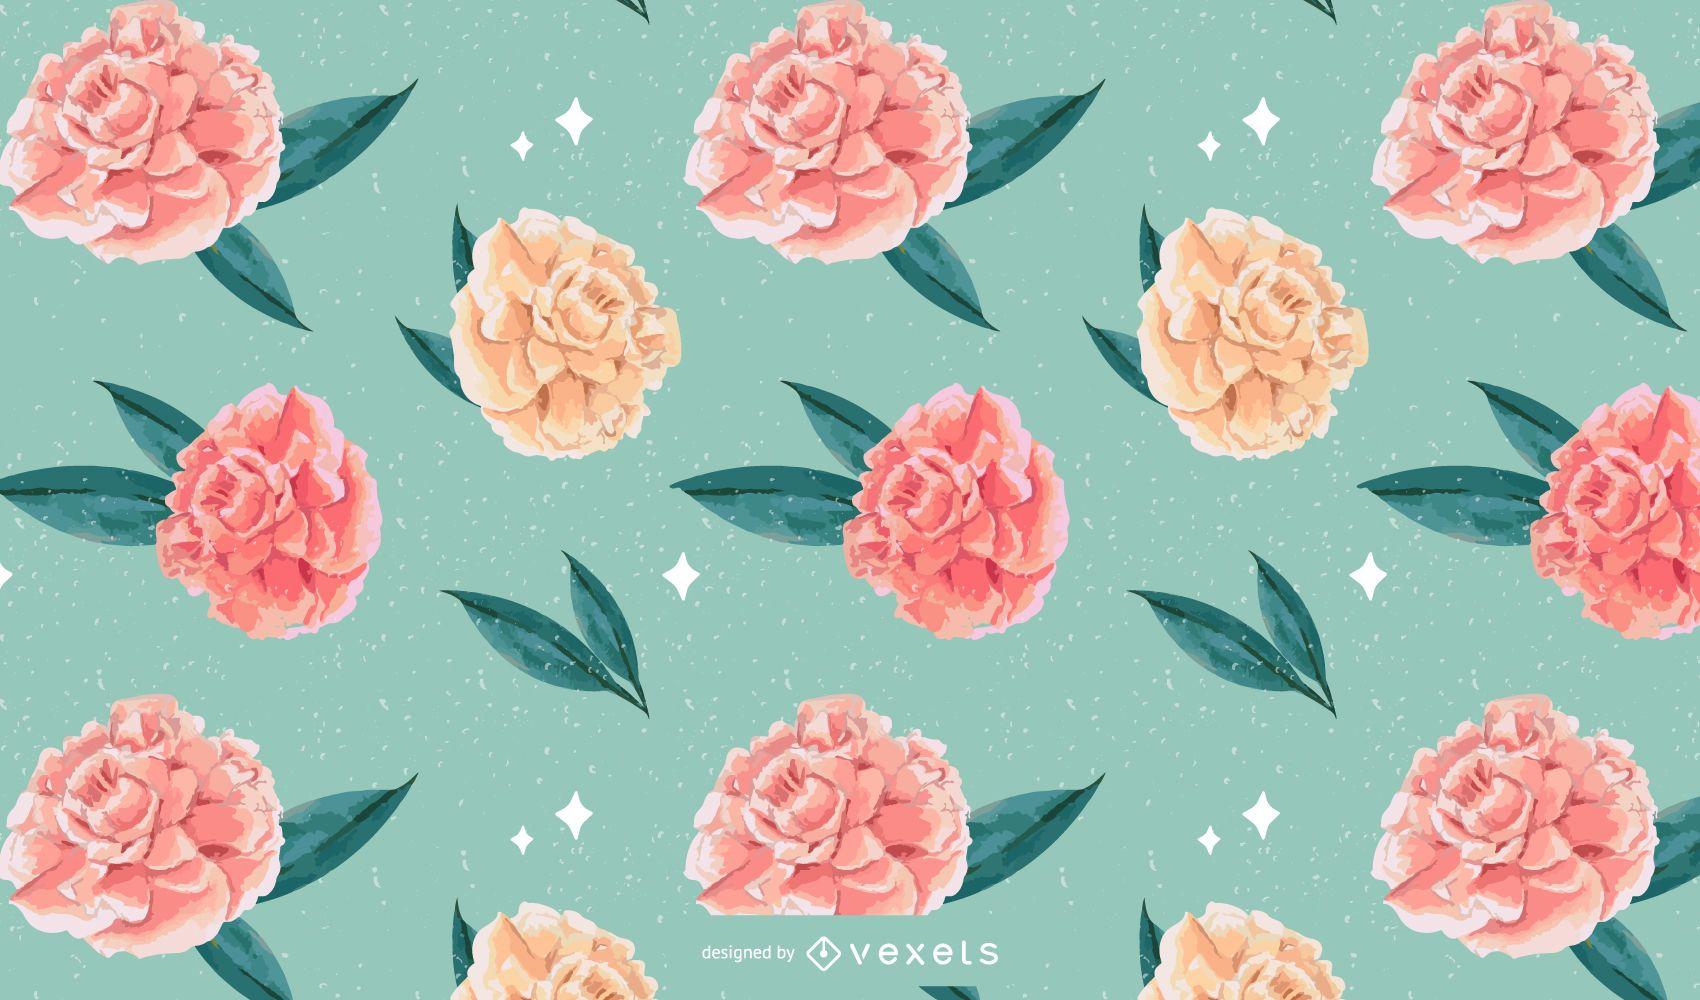 Blumen-Aquarell-Muster-Entwurf